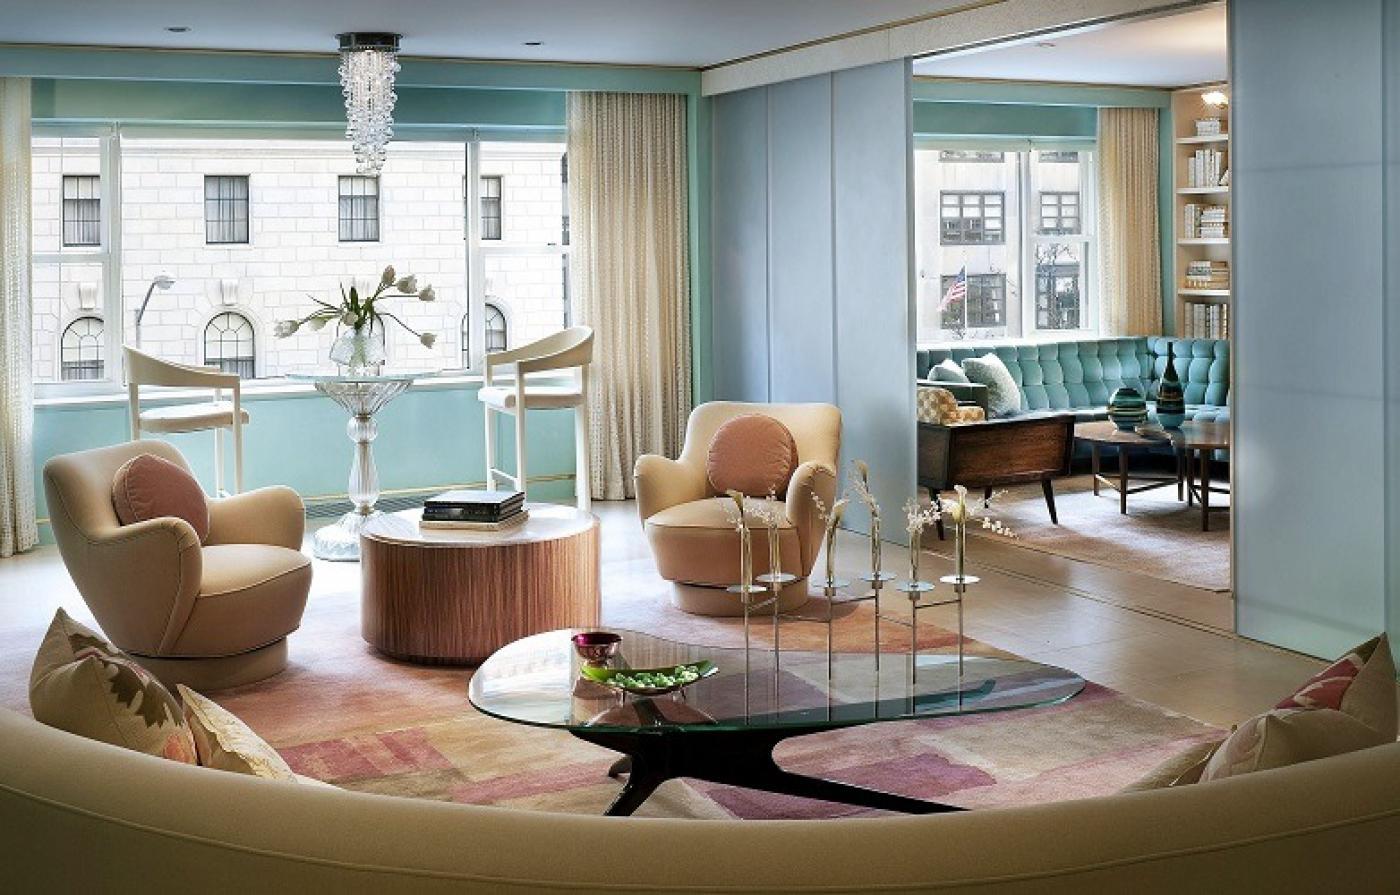 Park Avenue Apartment by Ike Kligerman Barkley